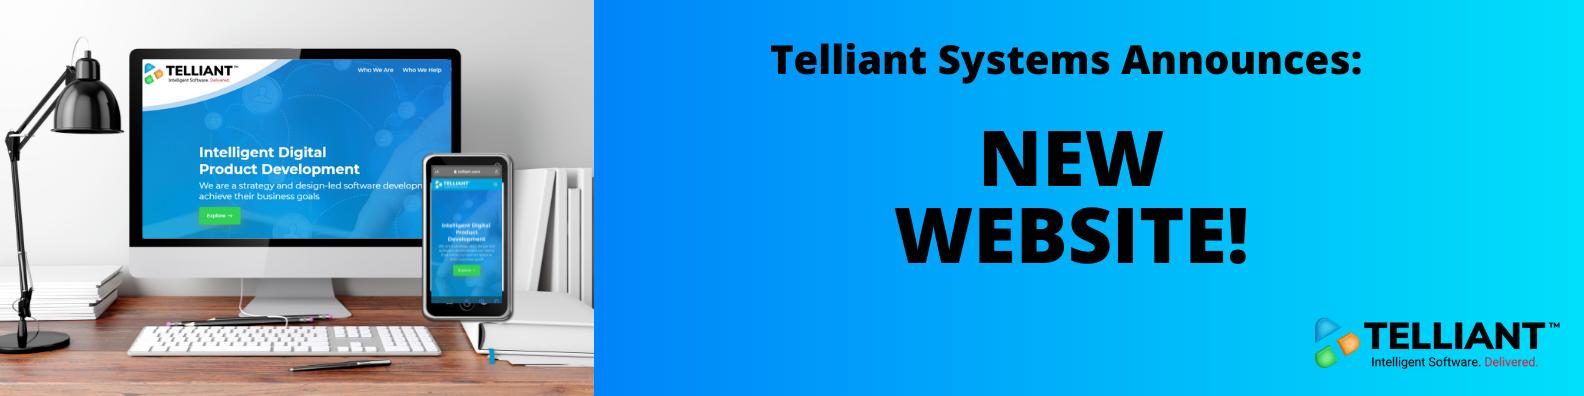 Telliant New Website 6 2021 2